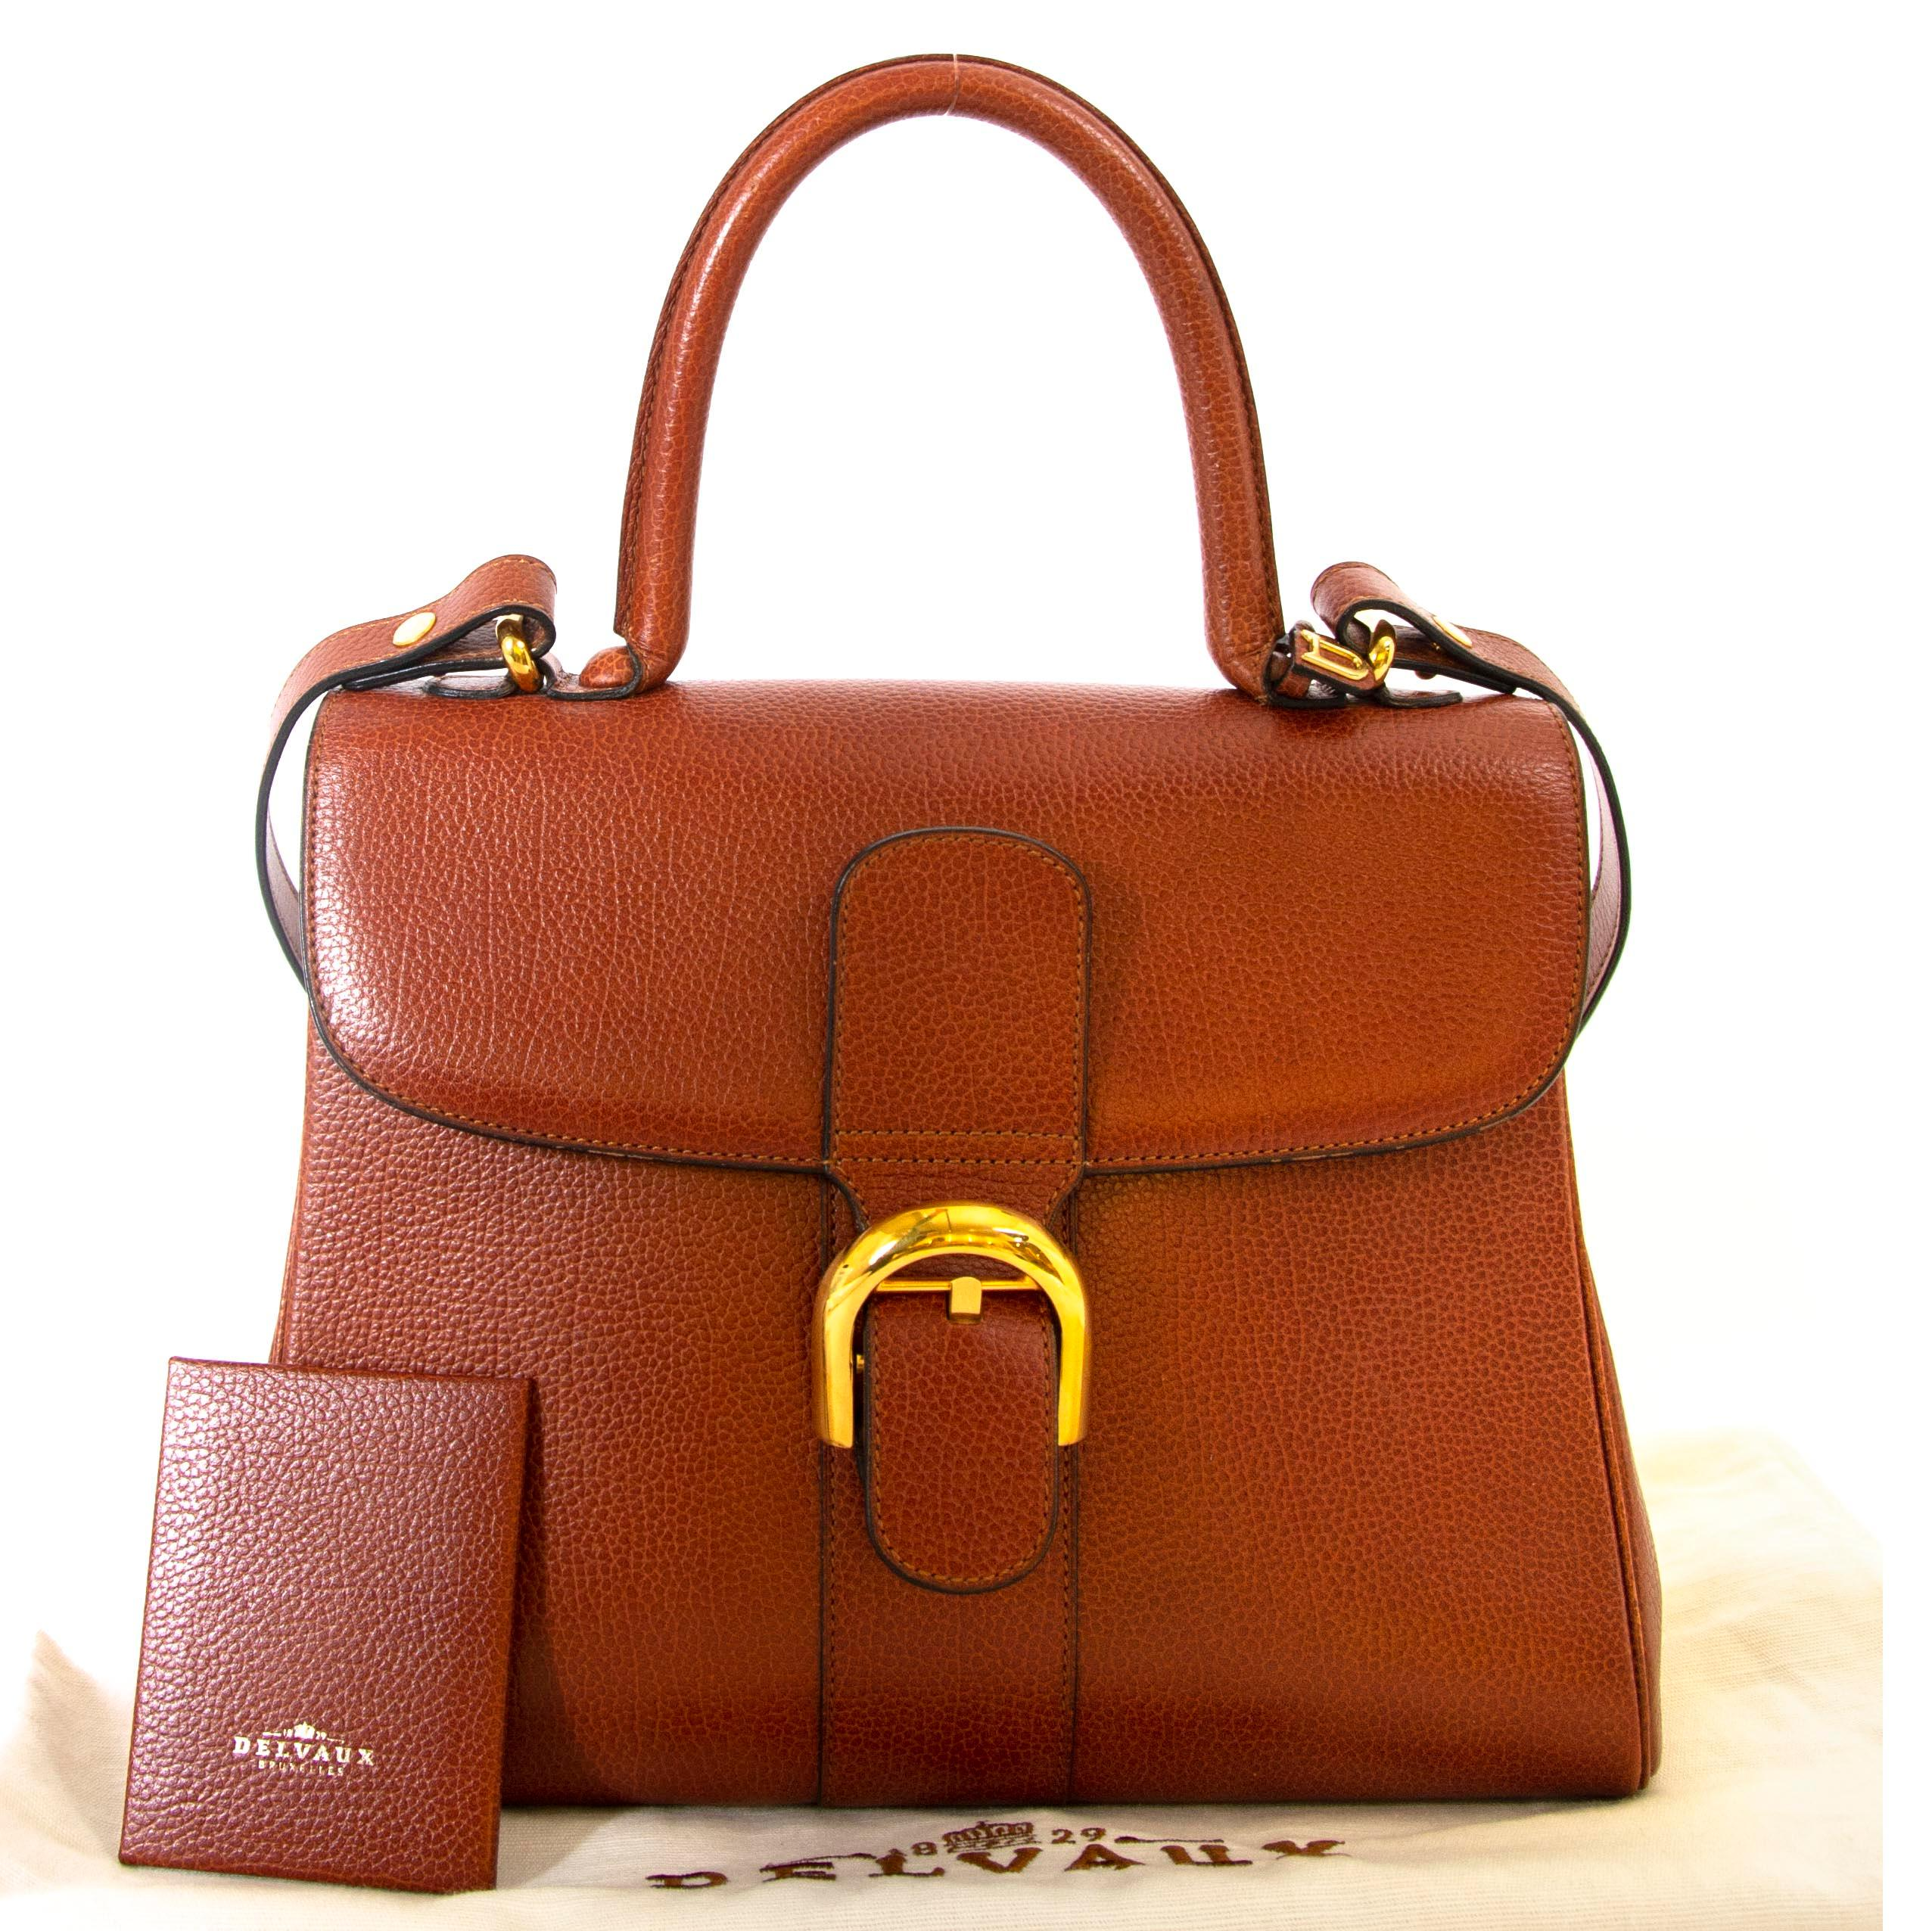 Delvaux Brillant Brown Mm Bag At 1stdibs